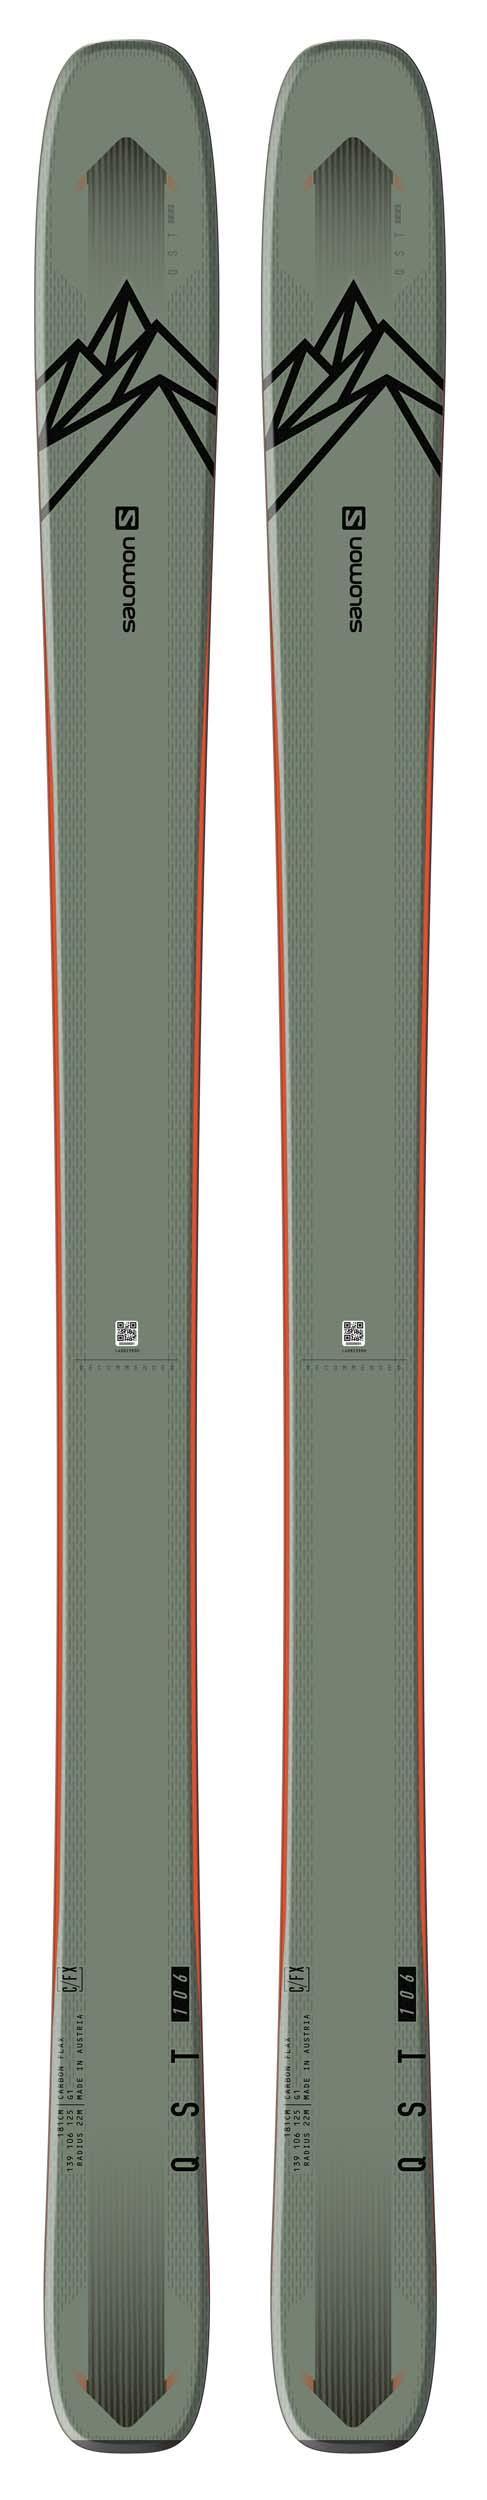 Salomon 2021 QST 106 Skis (Without Bindings / Flat) NEW !! 167,174,181,188cm